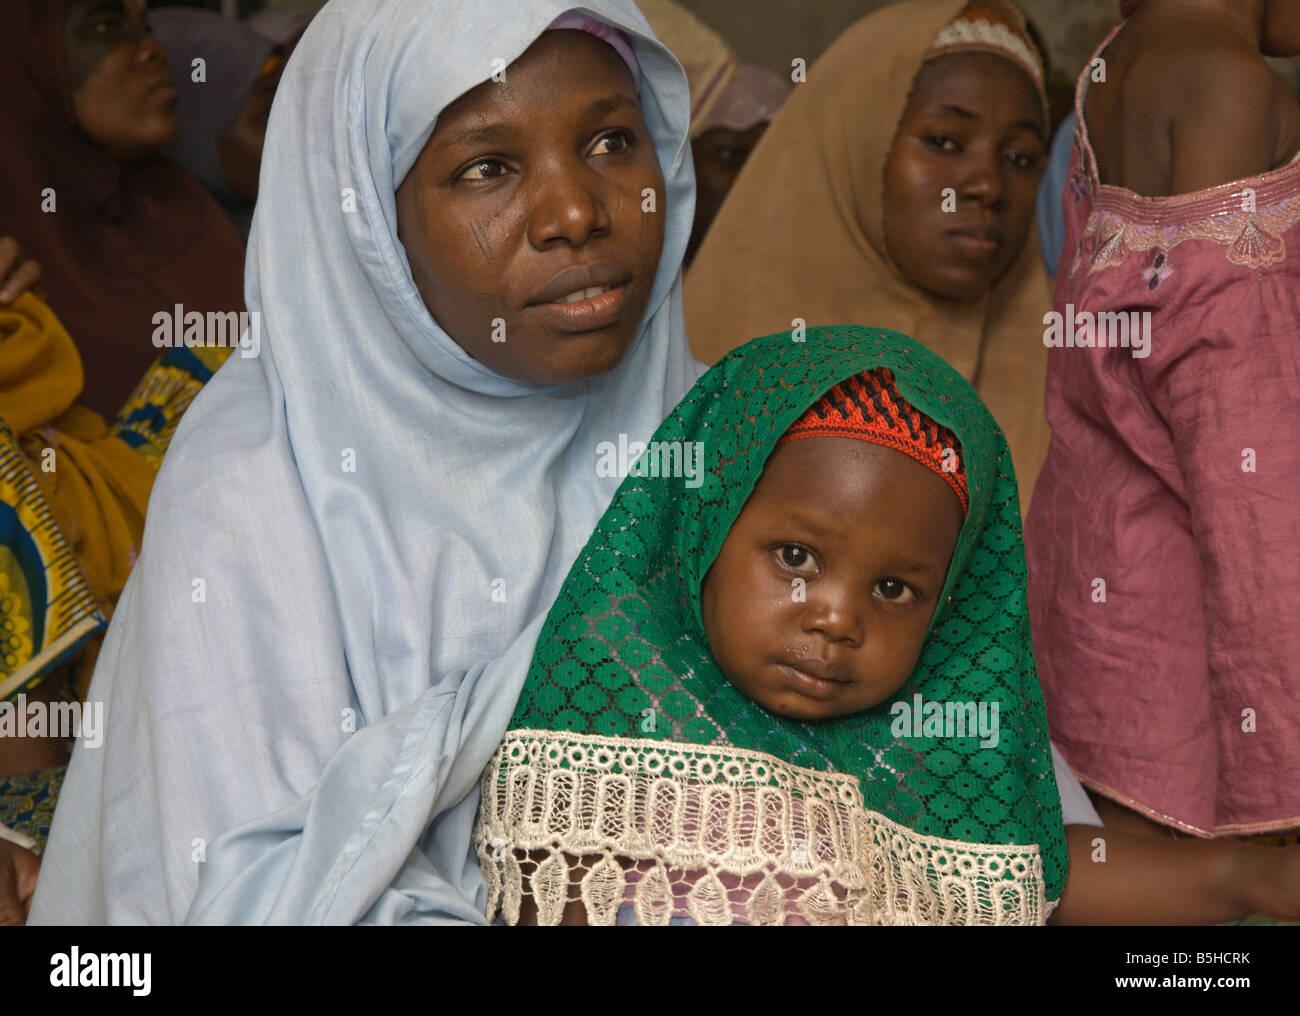 Fulani woman and child in the Tudun-Murtala area of Kano, Nigeria - Stock Image